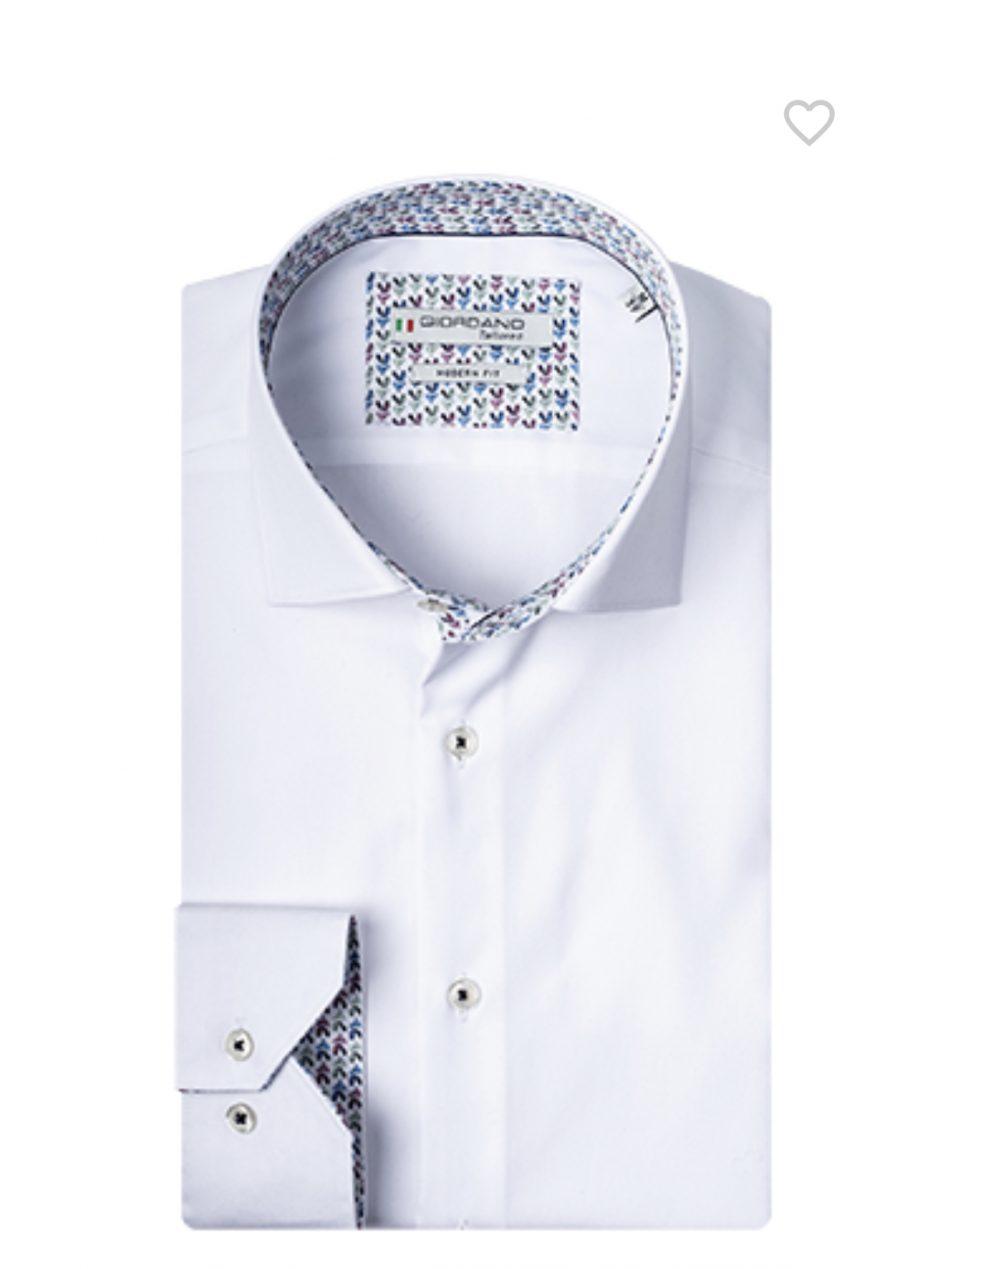 Giordano White Premium Cotton Shirt